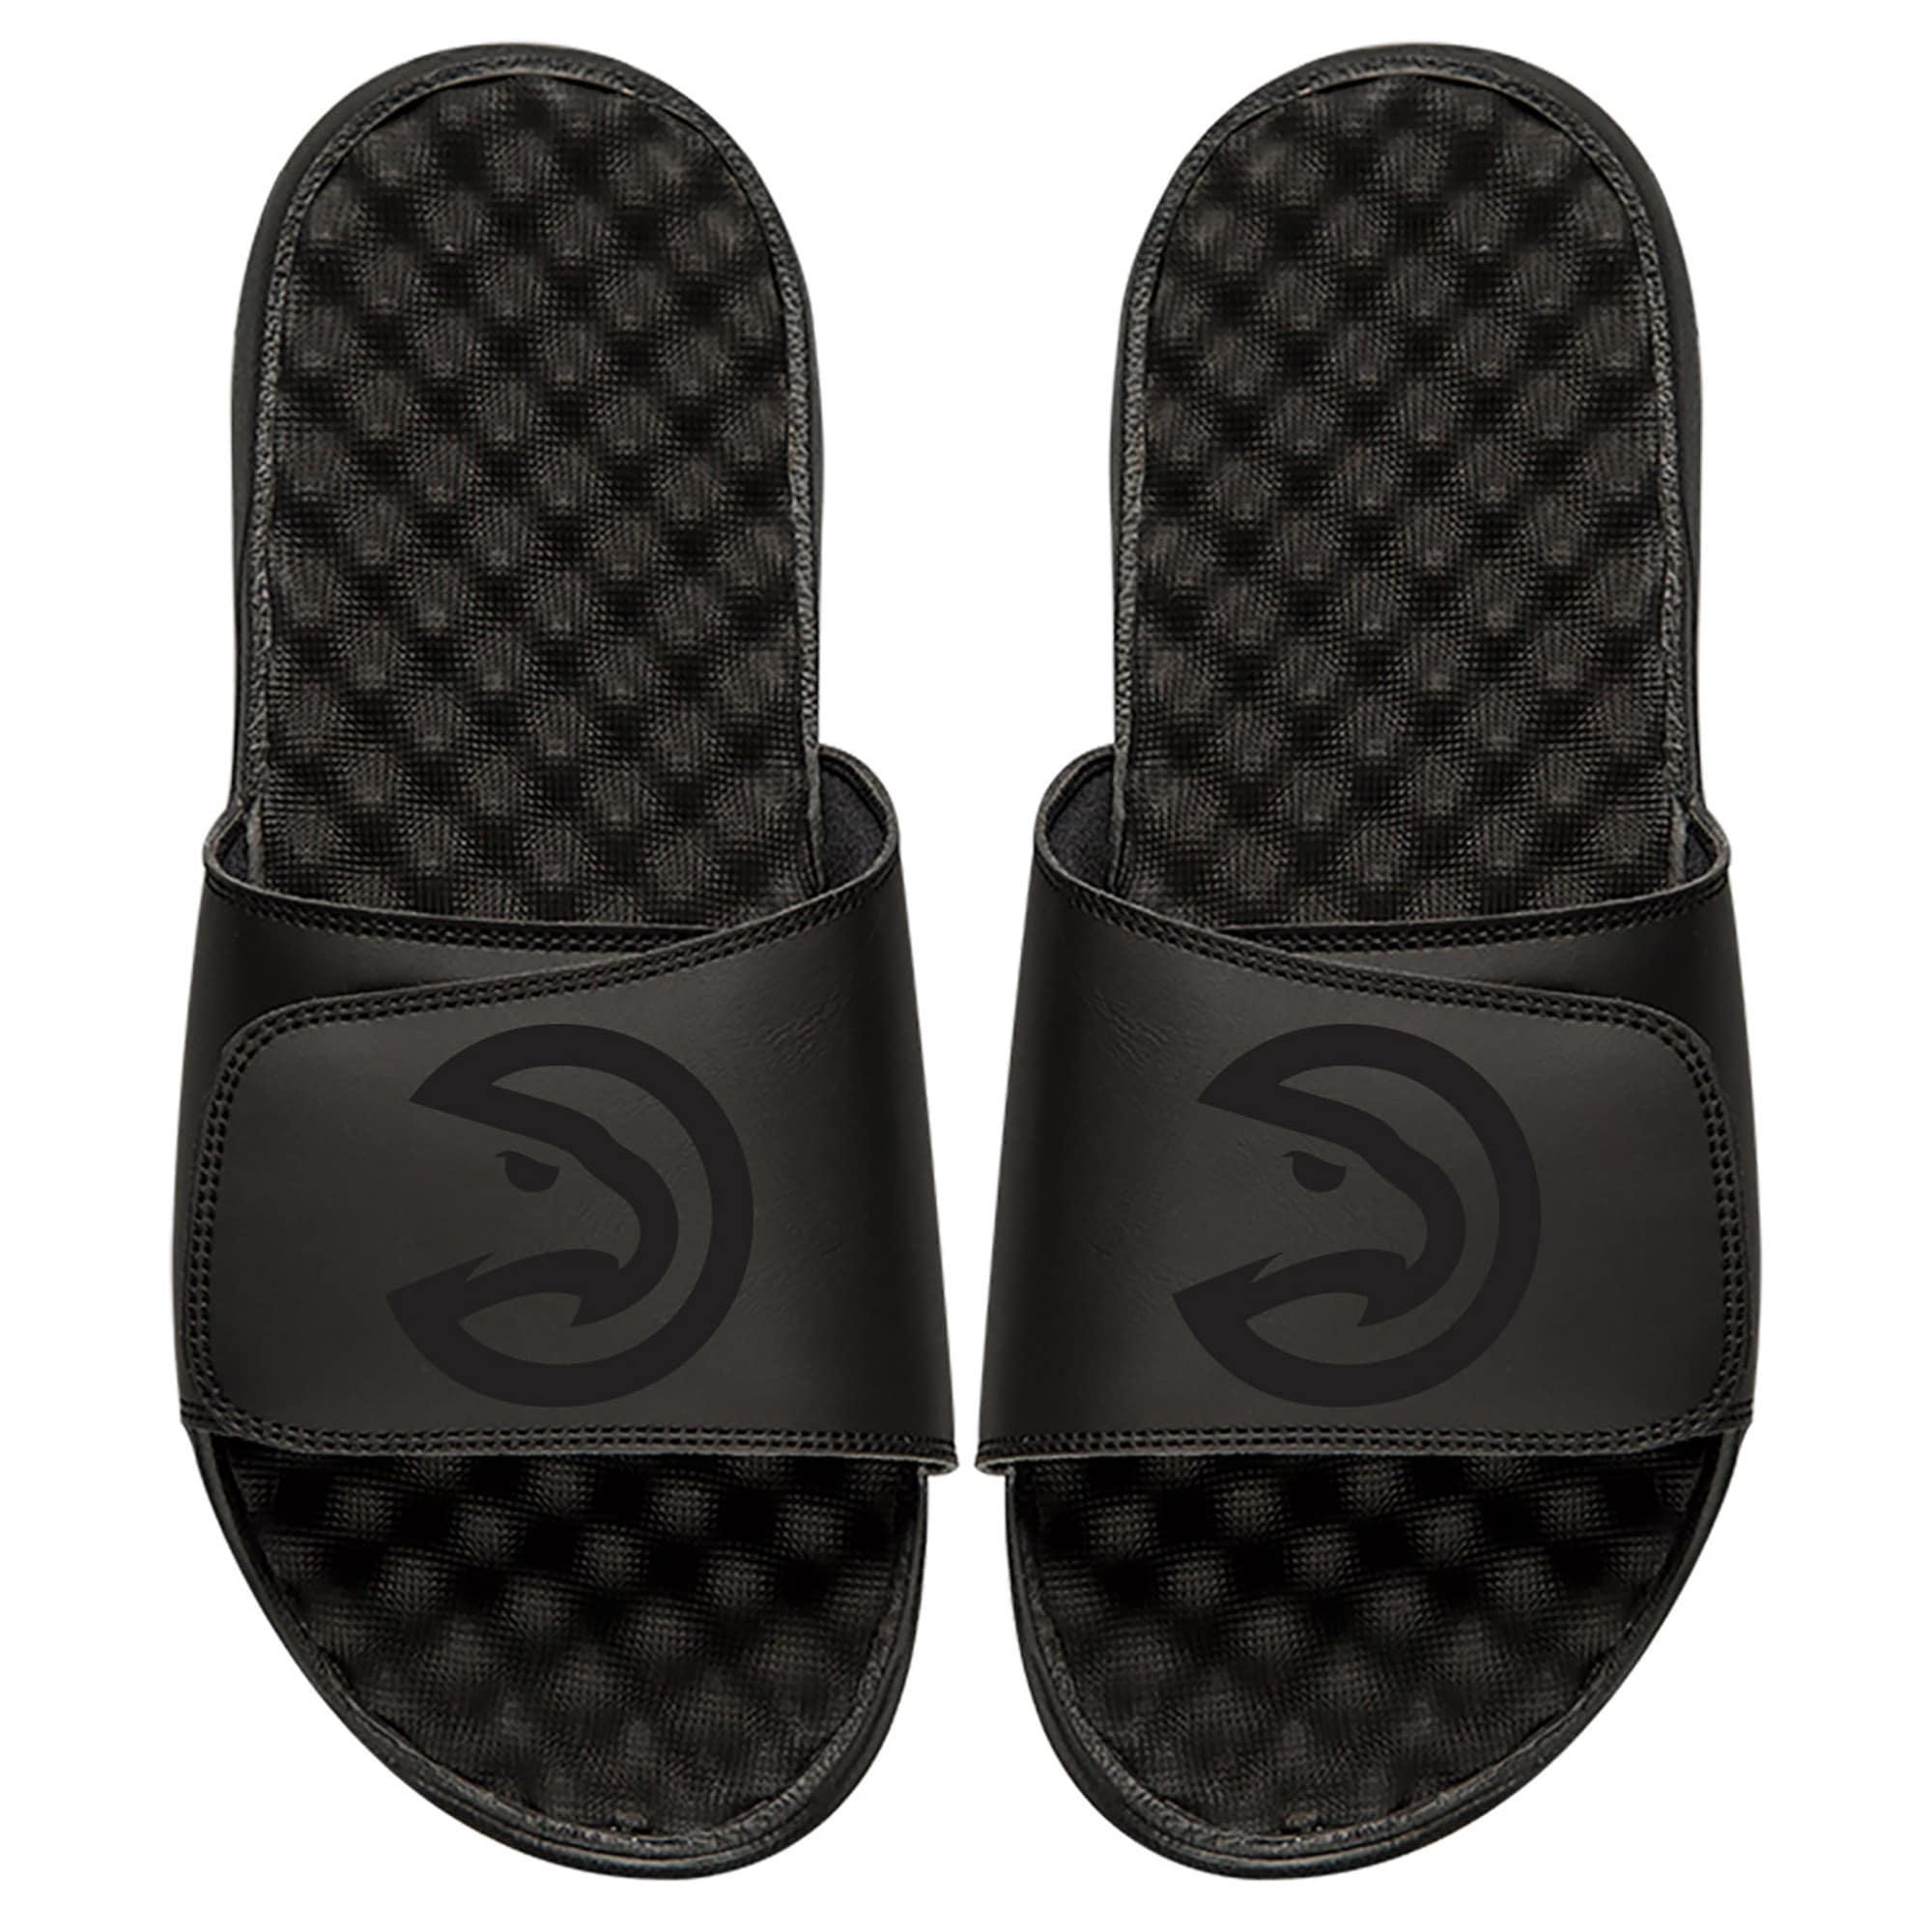 Atlanta Hawks ISlide Tonal Slide Sandals - Black